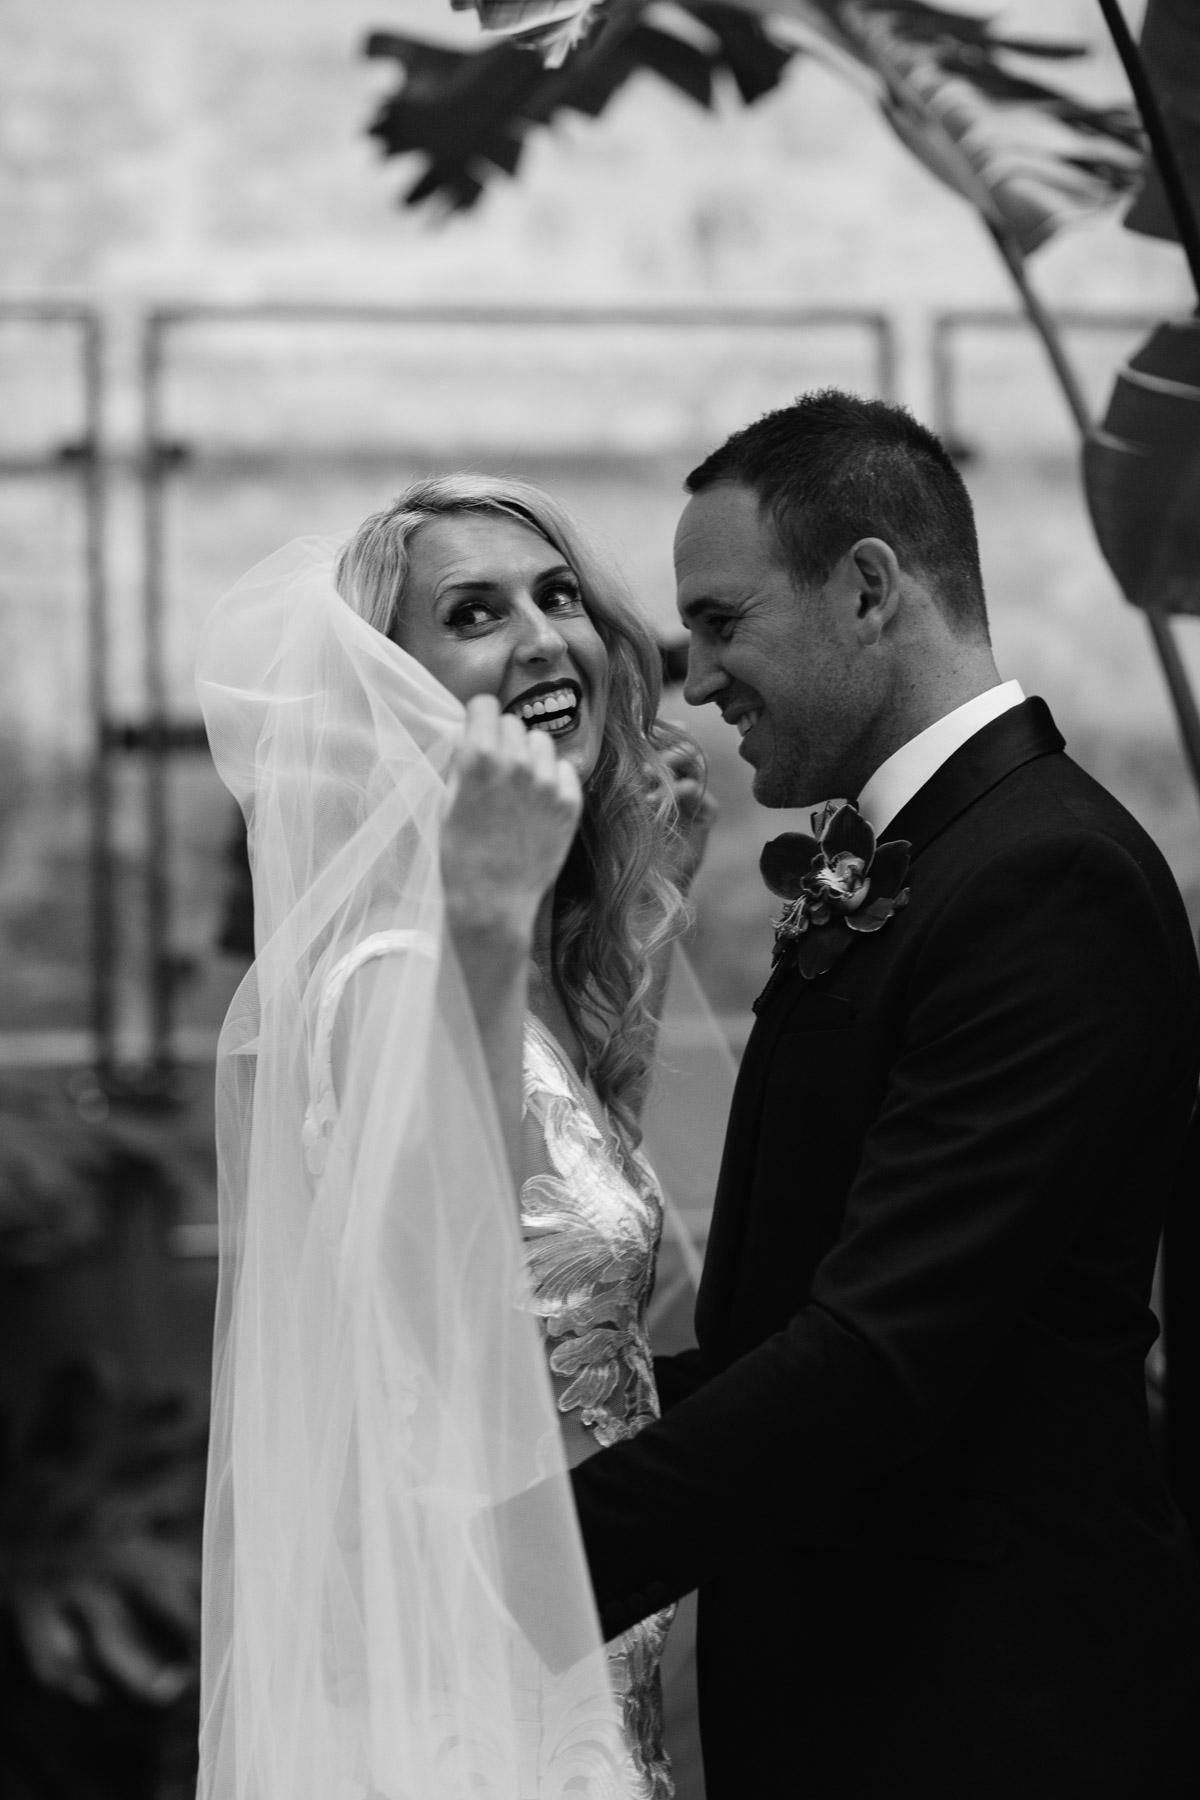 Jess + Jason-The Flour Factory wedding-86.jpg